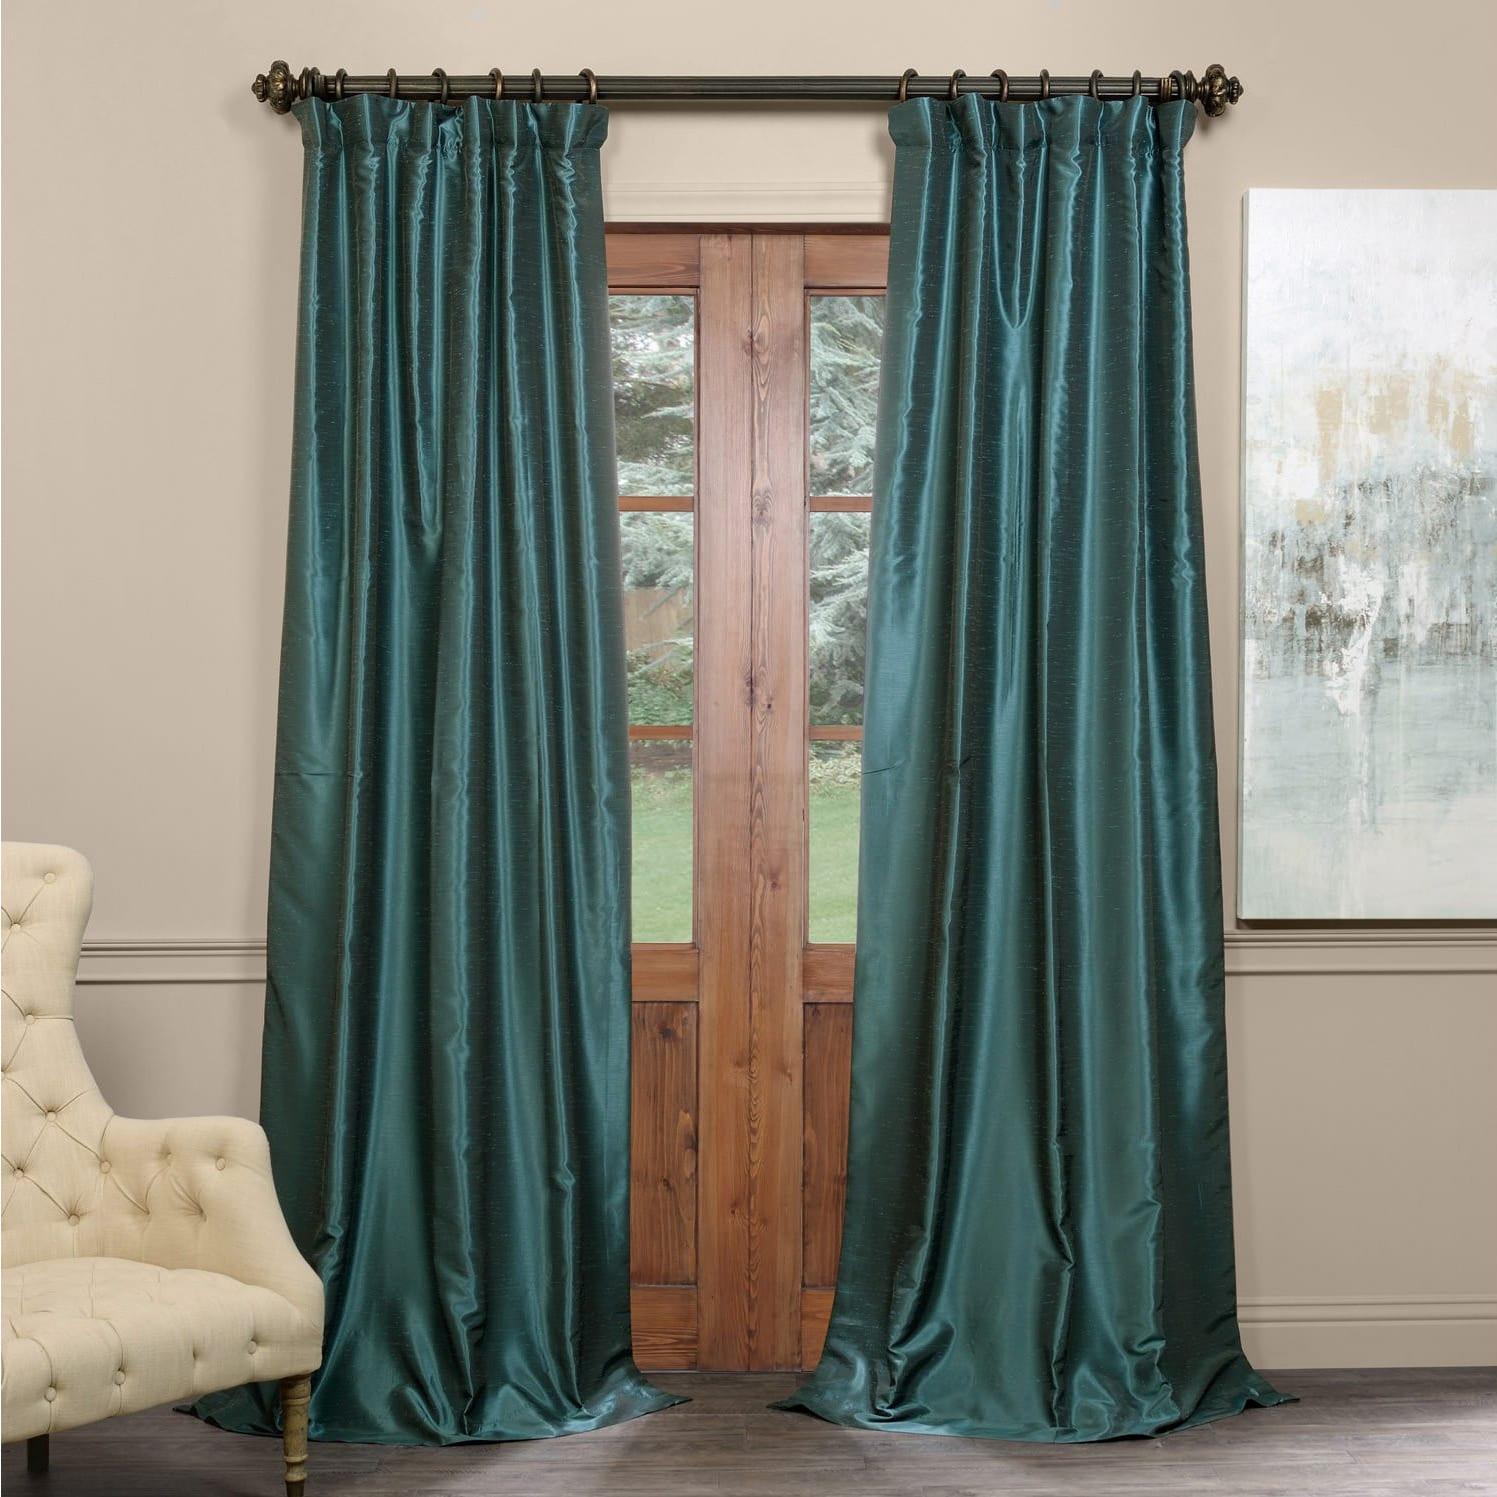 Exclusive Fabrics True Blackout Vintage Textured Faux Dupioni Silk